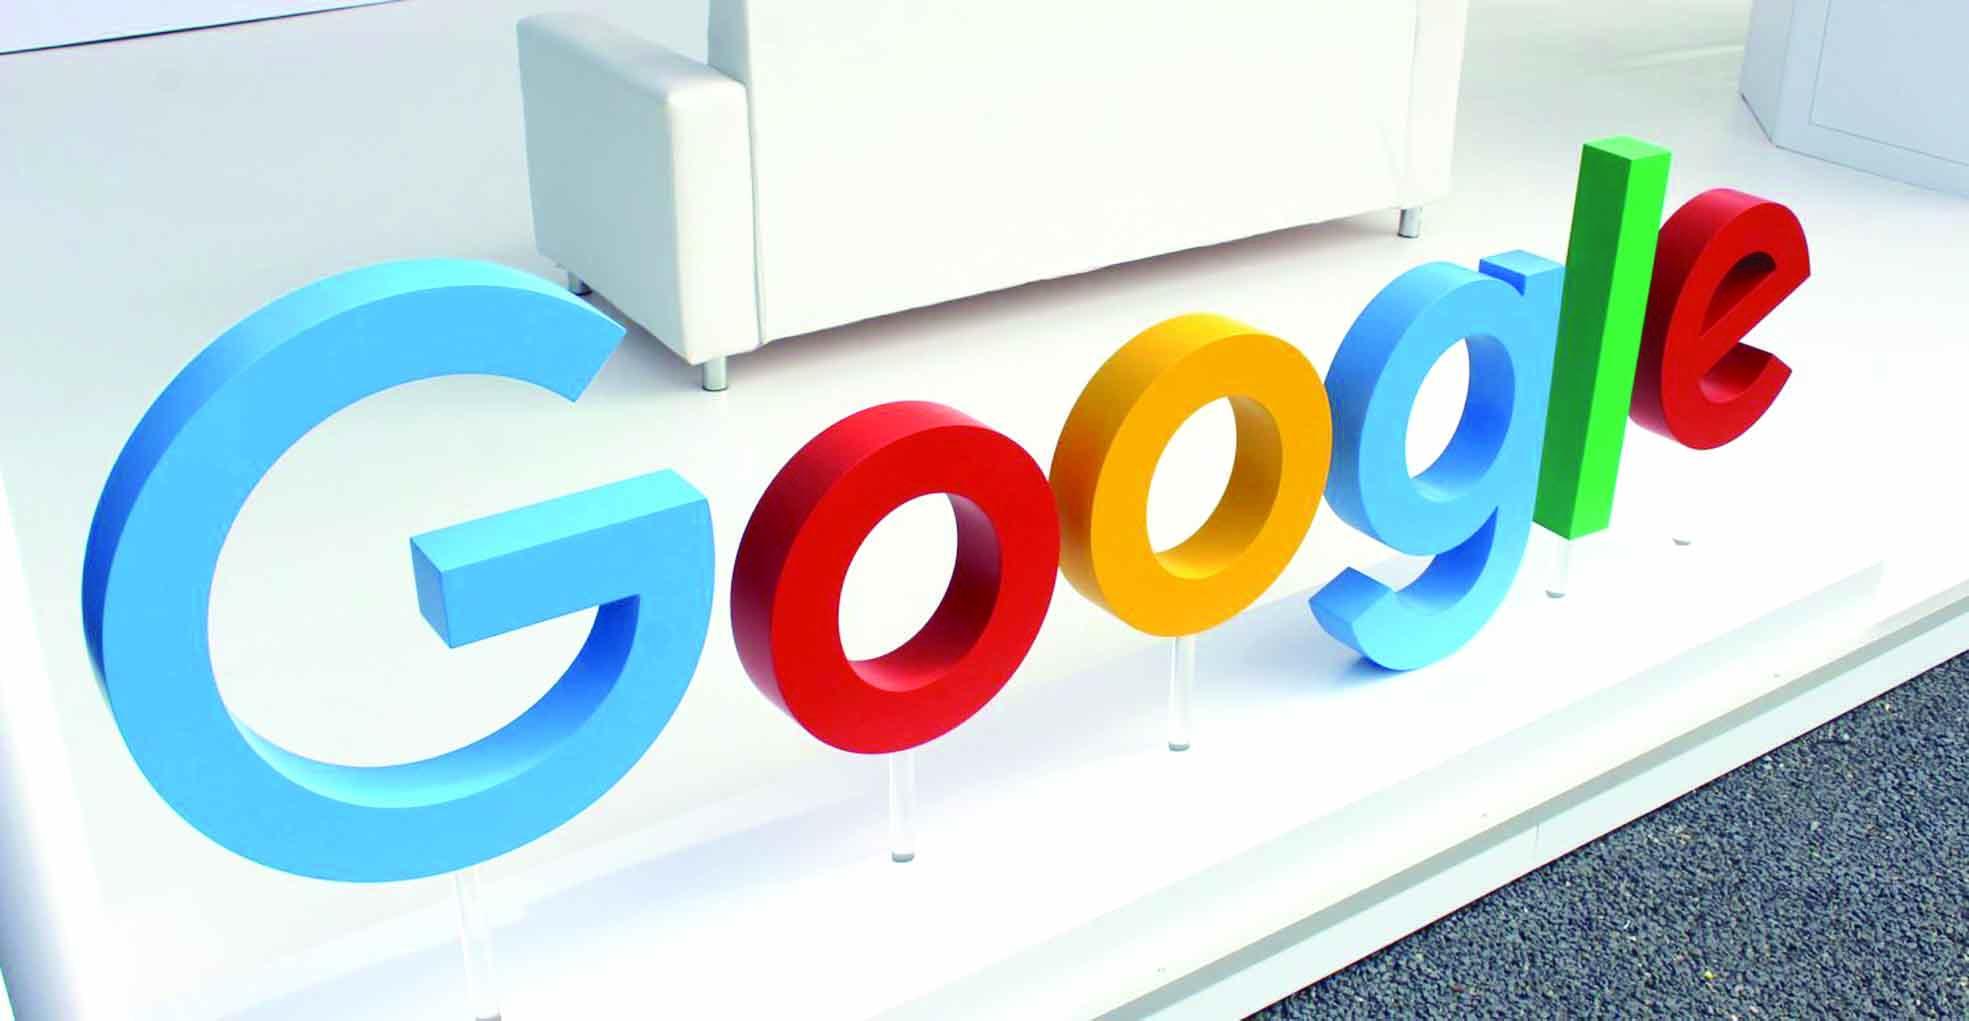 جوجل تطلق أندرويد «أوريو»!